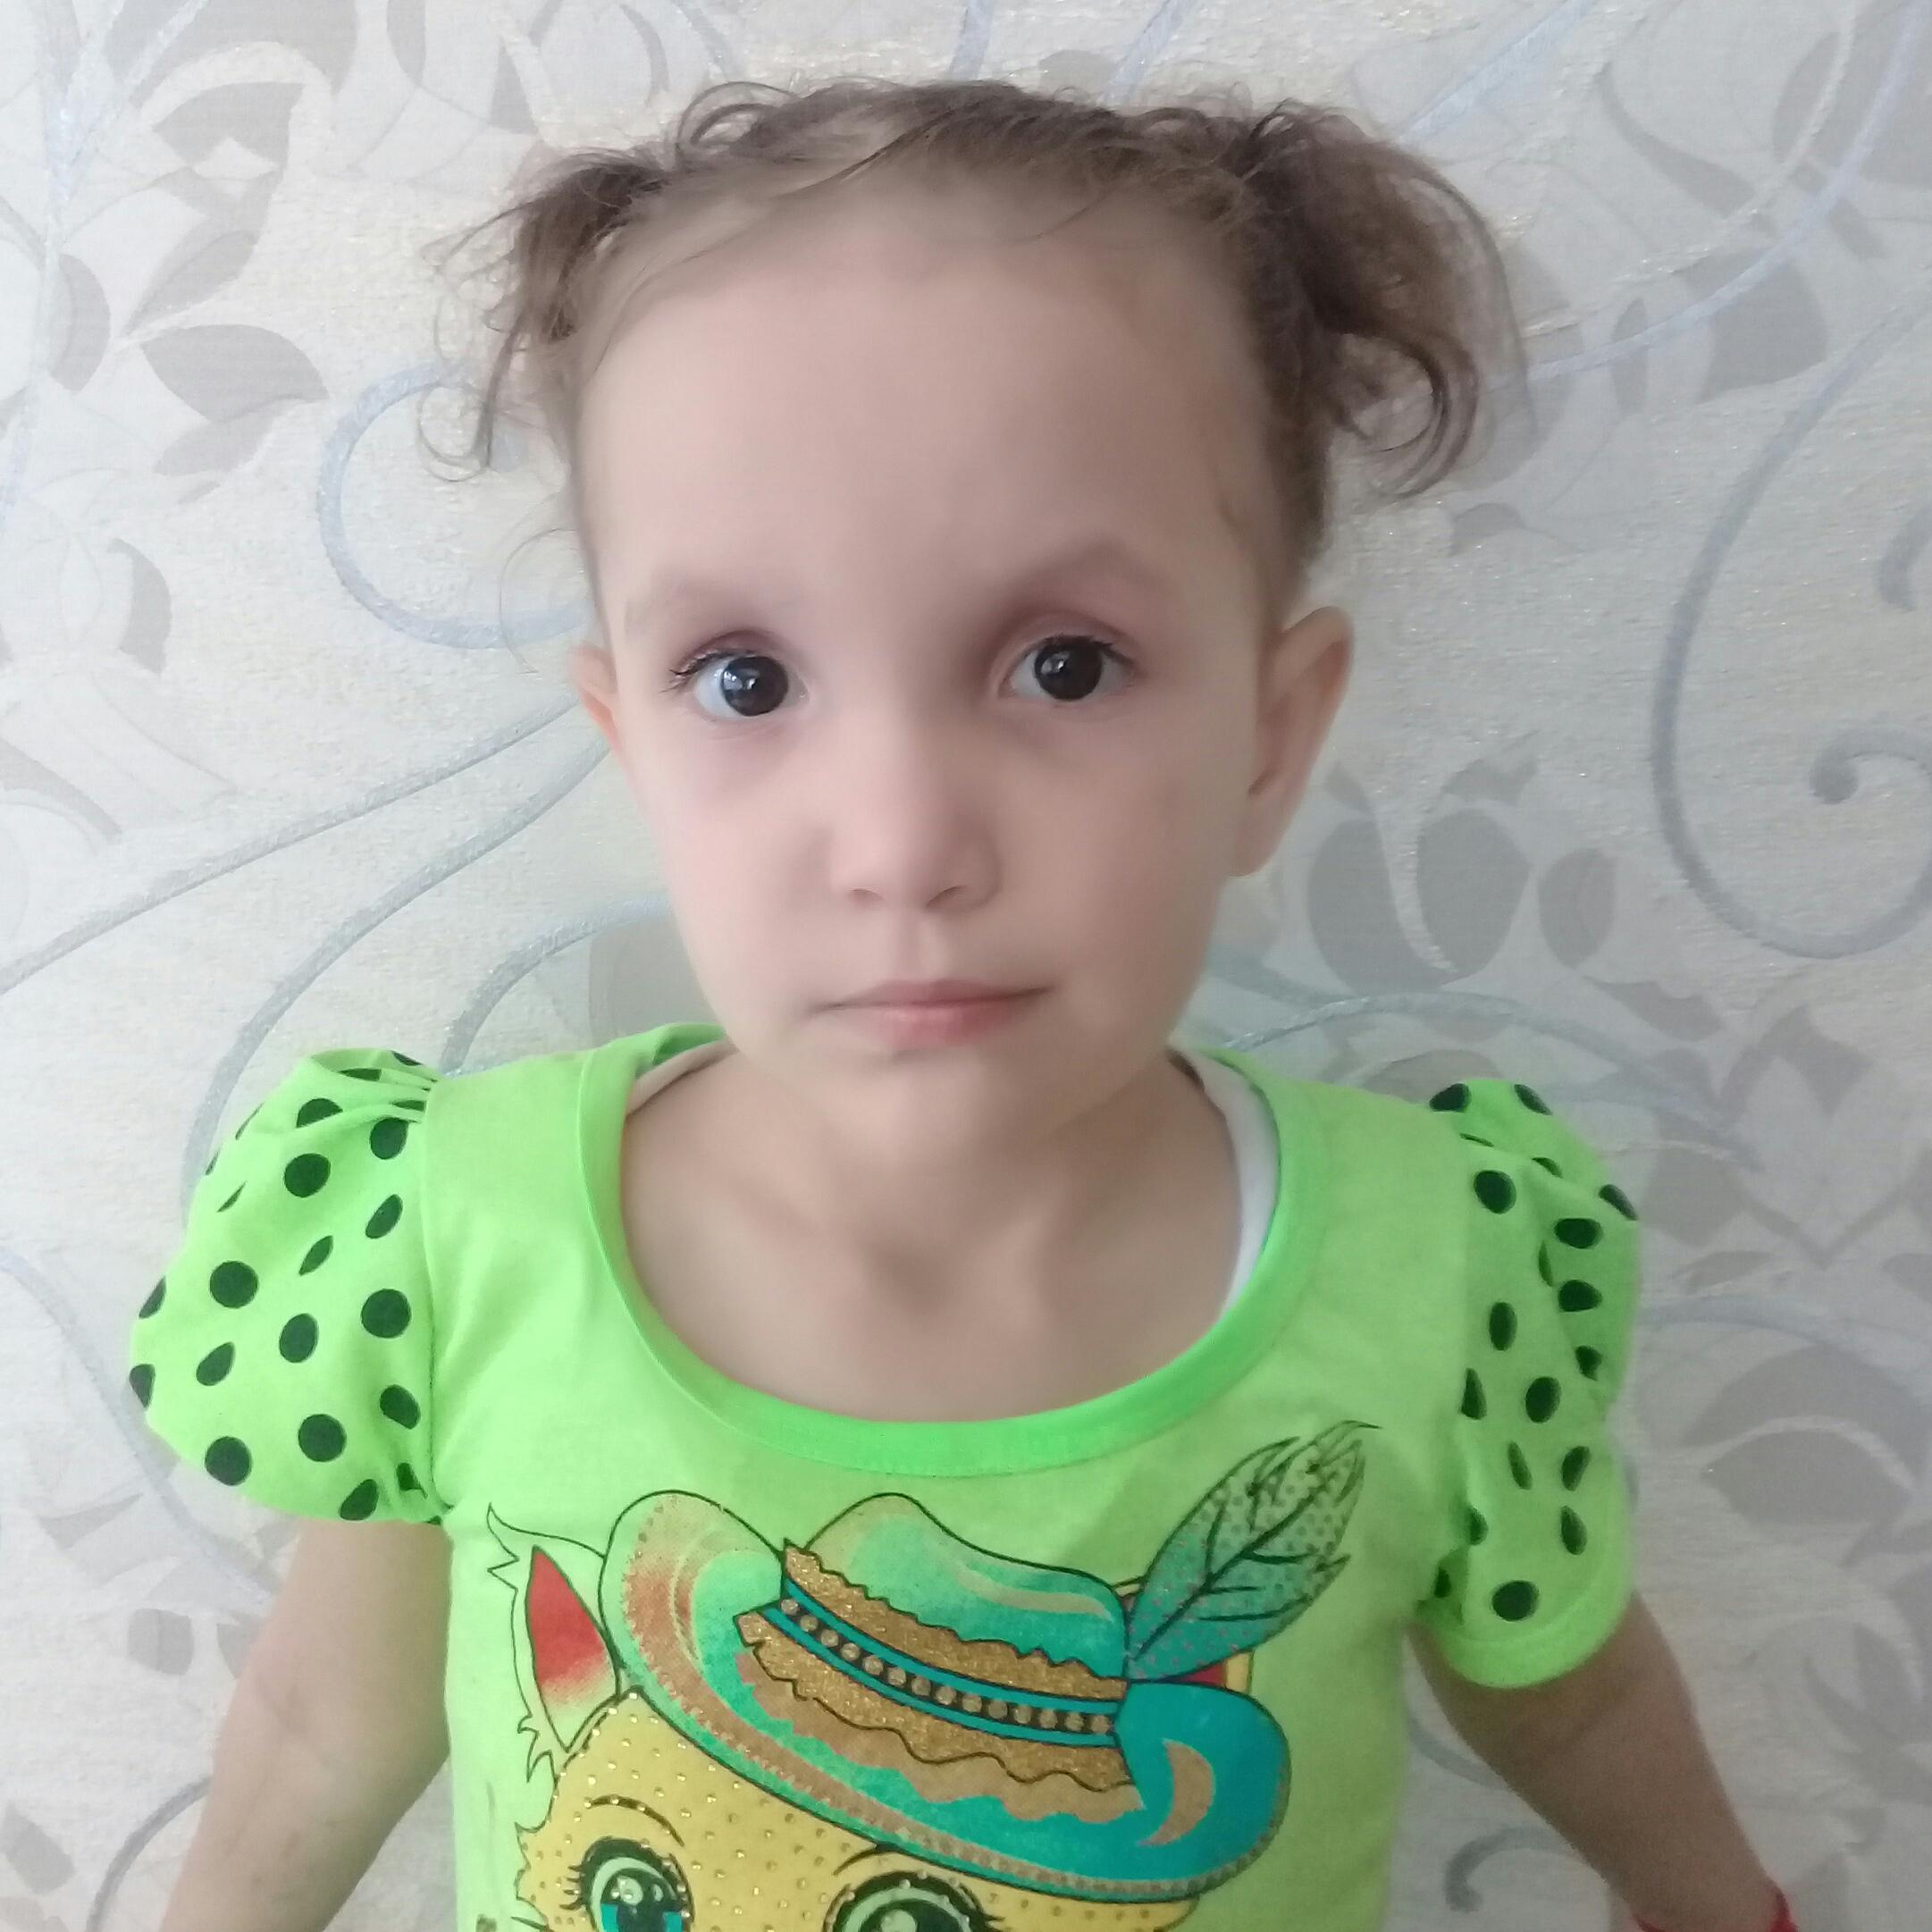 Жизнь Как Чудо Аделина Шамсутдинова Аделина Шамсутдинова